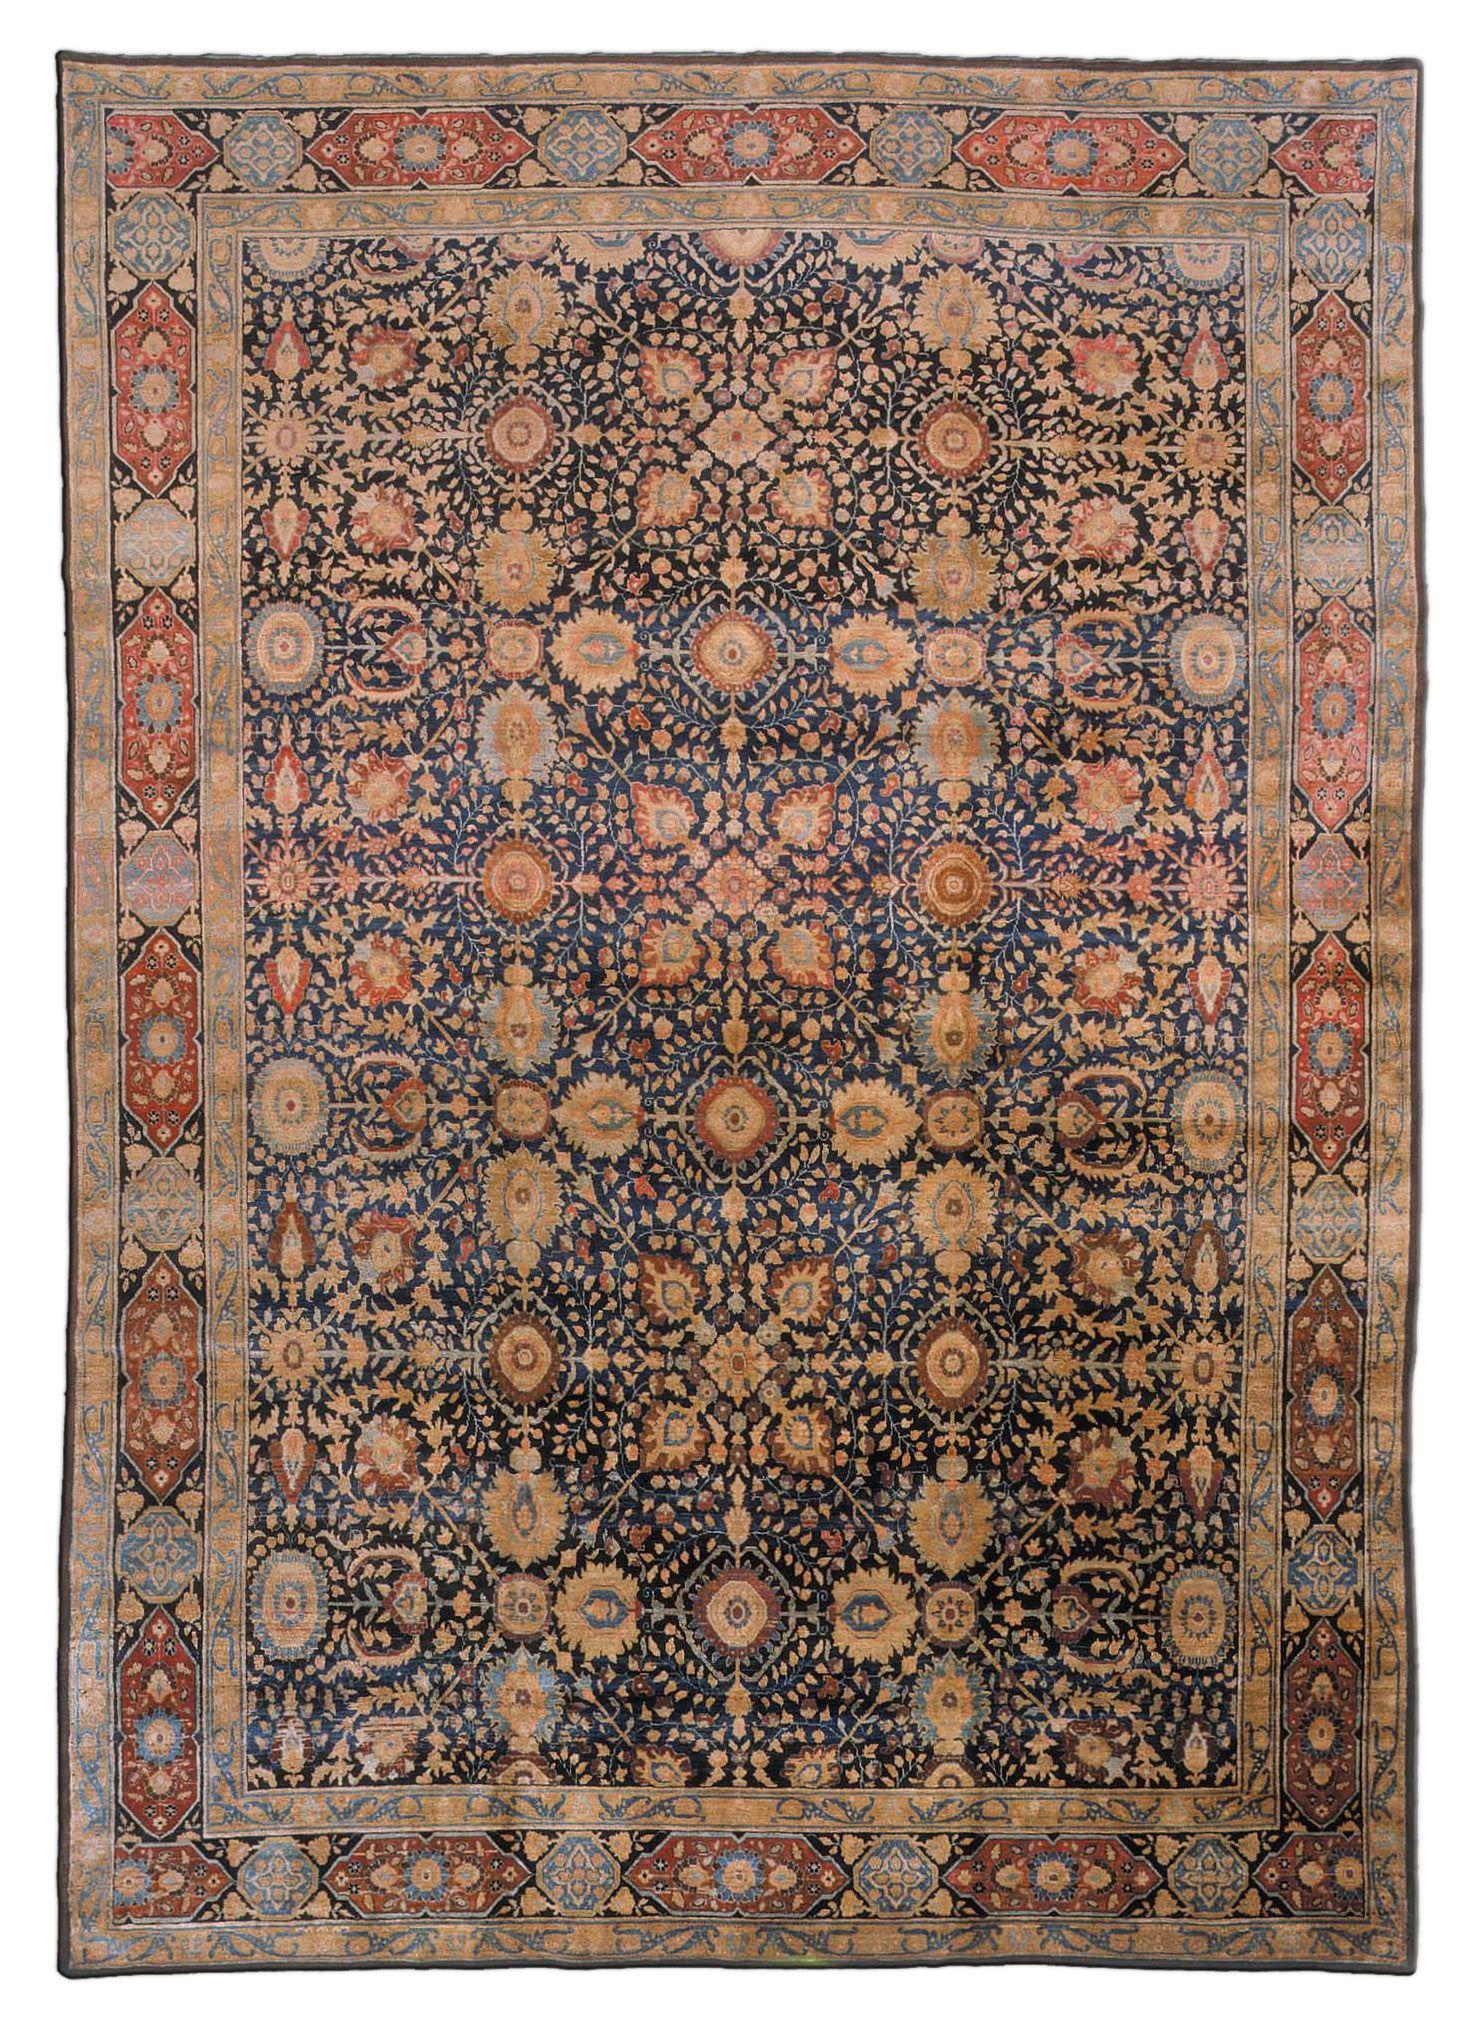 Antique Persian Tabriz Carpet Bb7404 By Dlb Persian Rug Rugs Tabriz Rug